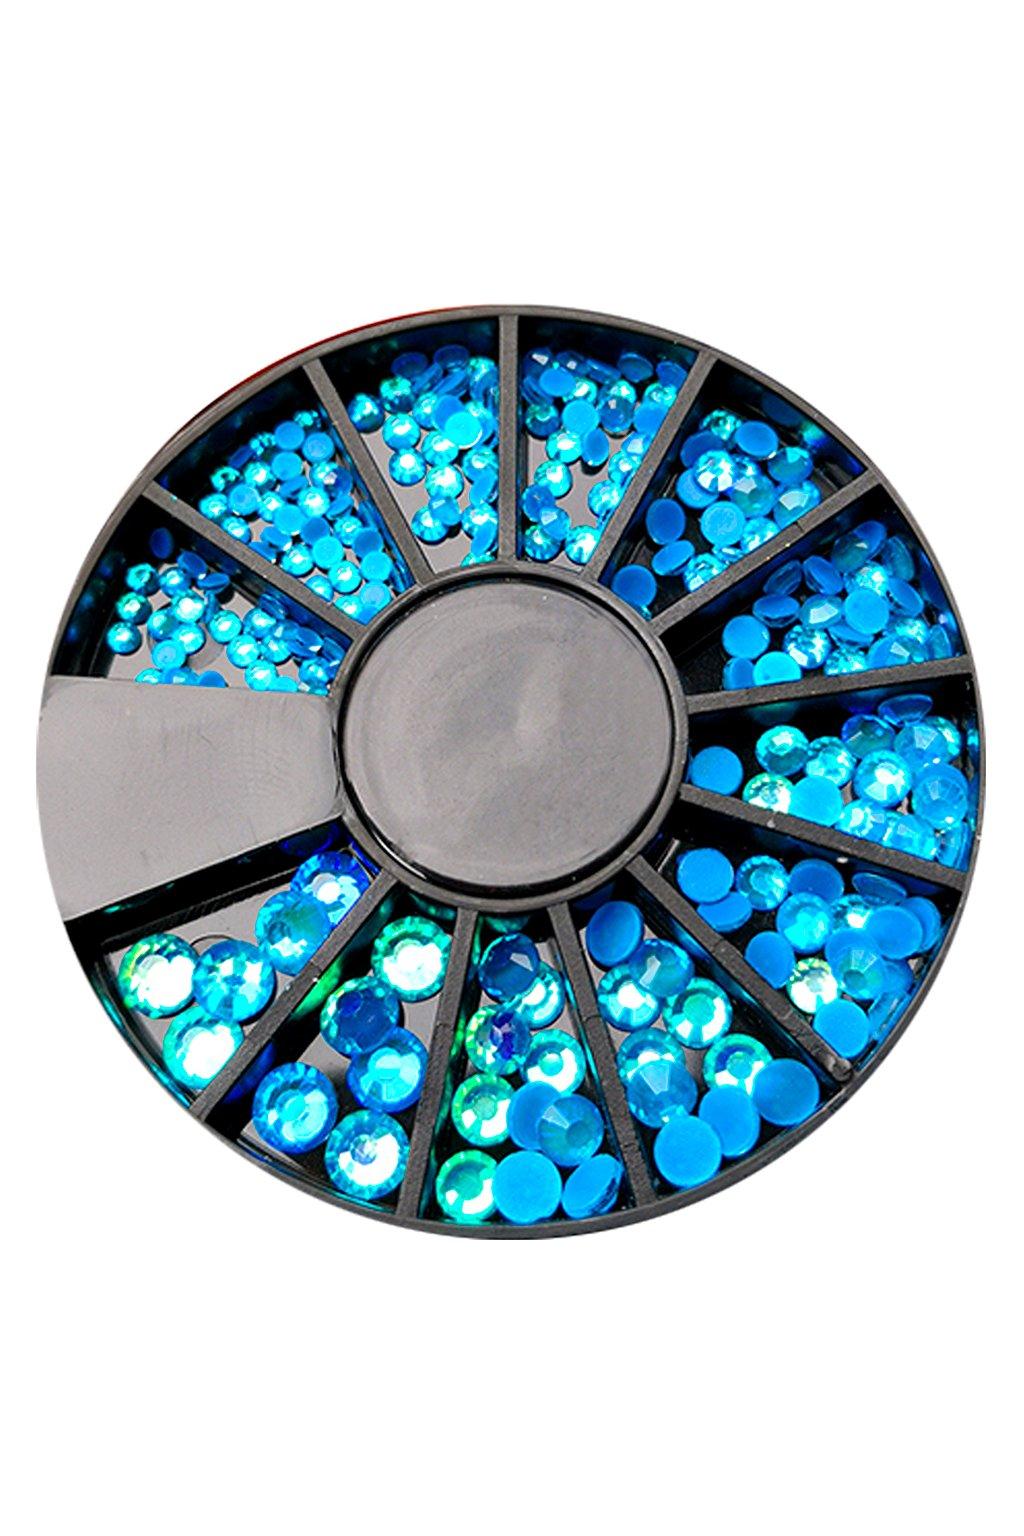 Karusel kamínků Neon Blue